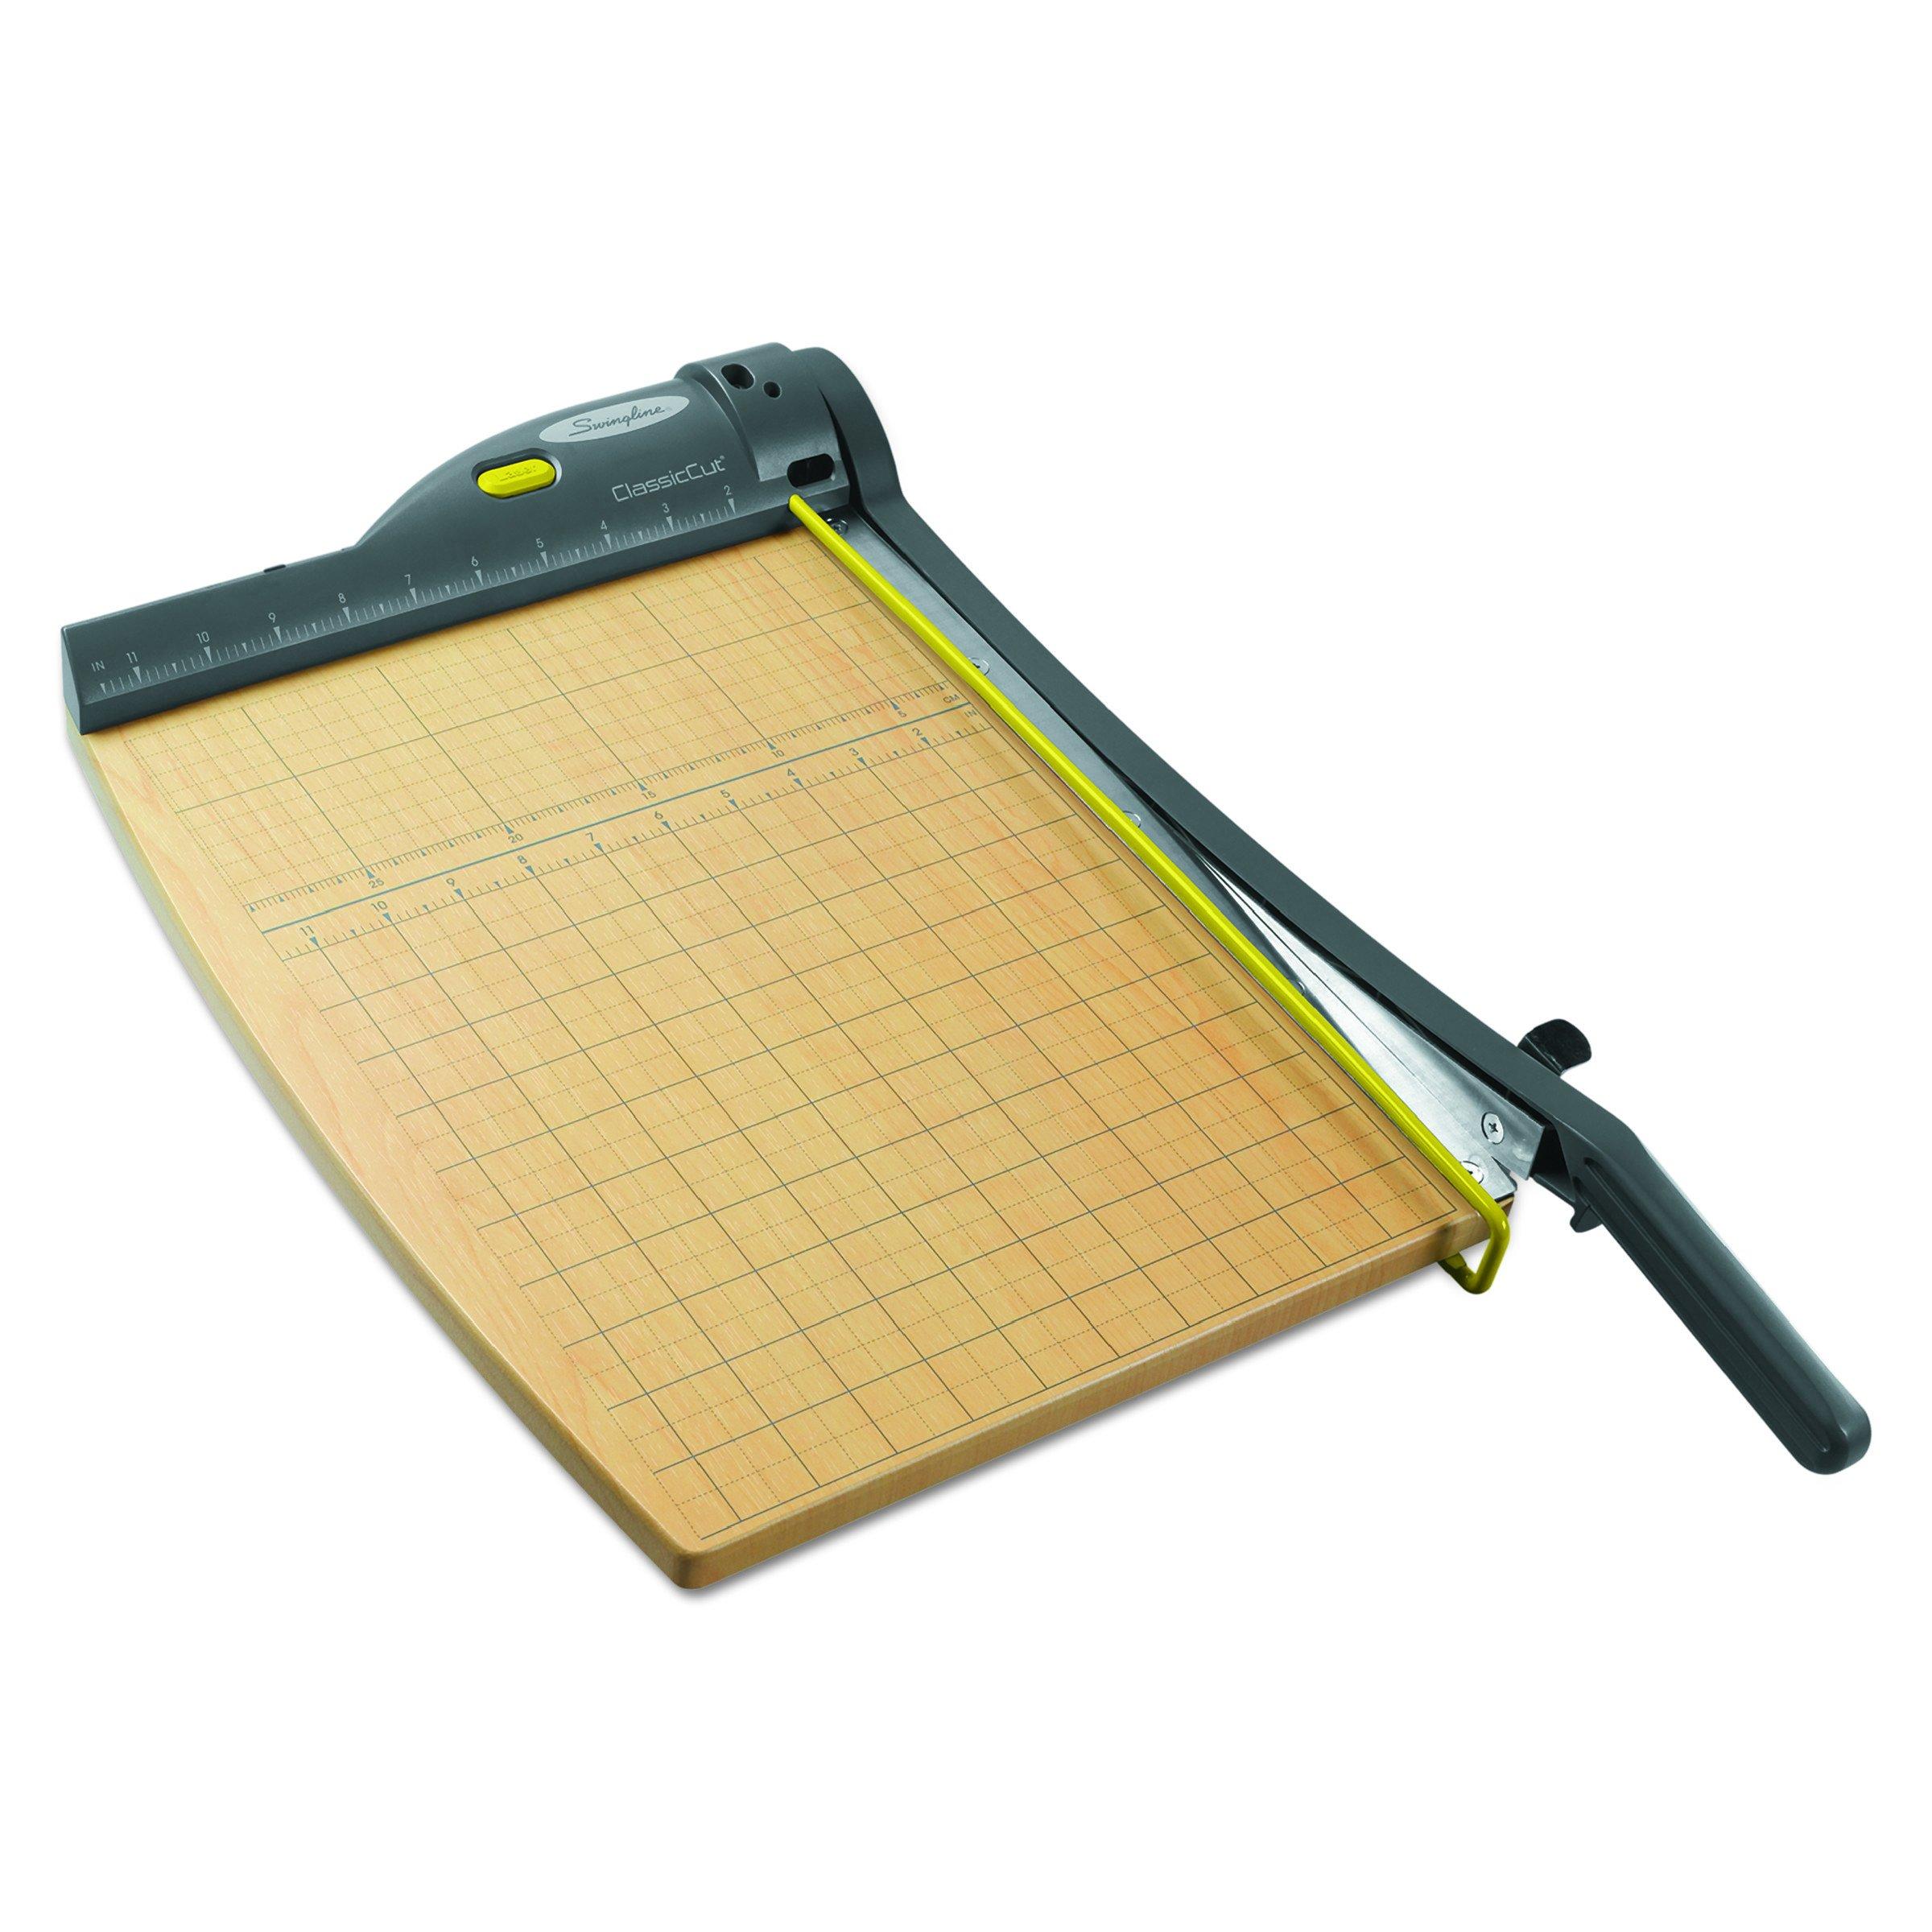 Swingline 9715 ClassicCut 15-Sheet Laser Trimmer, Metal/Wood Composite Base, 12 x 15